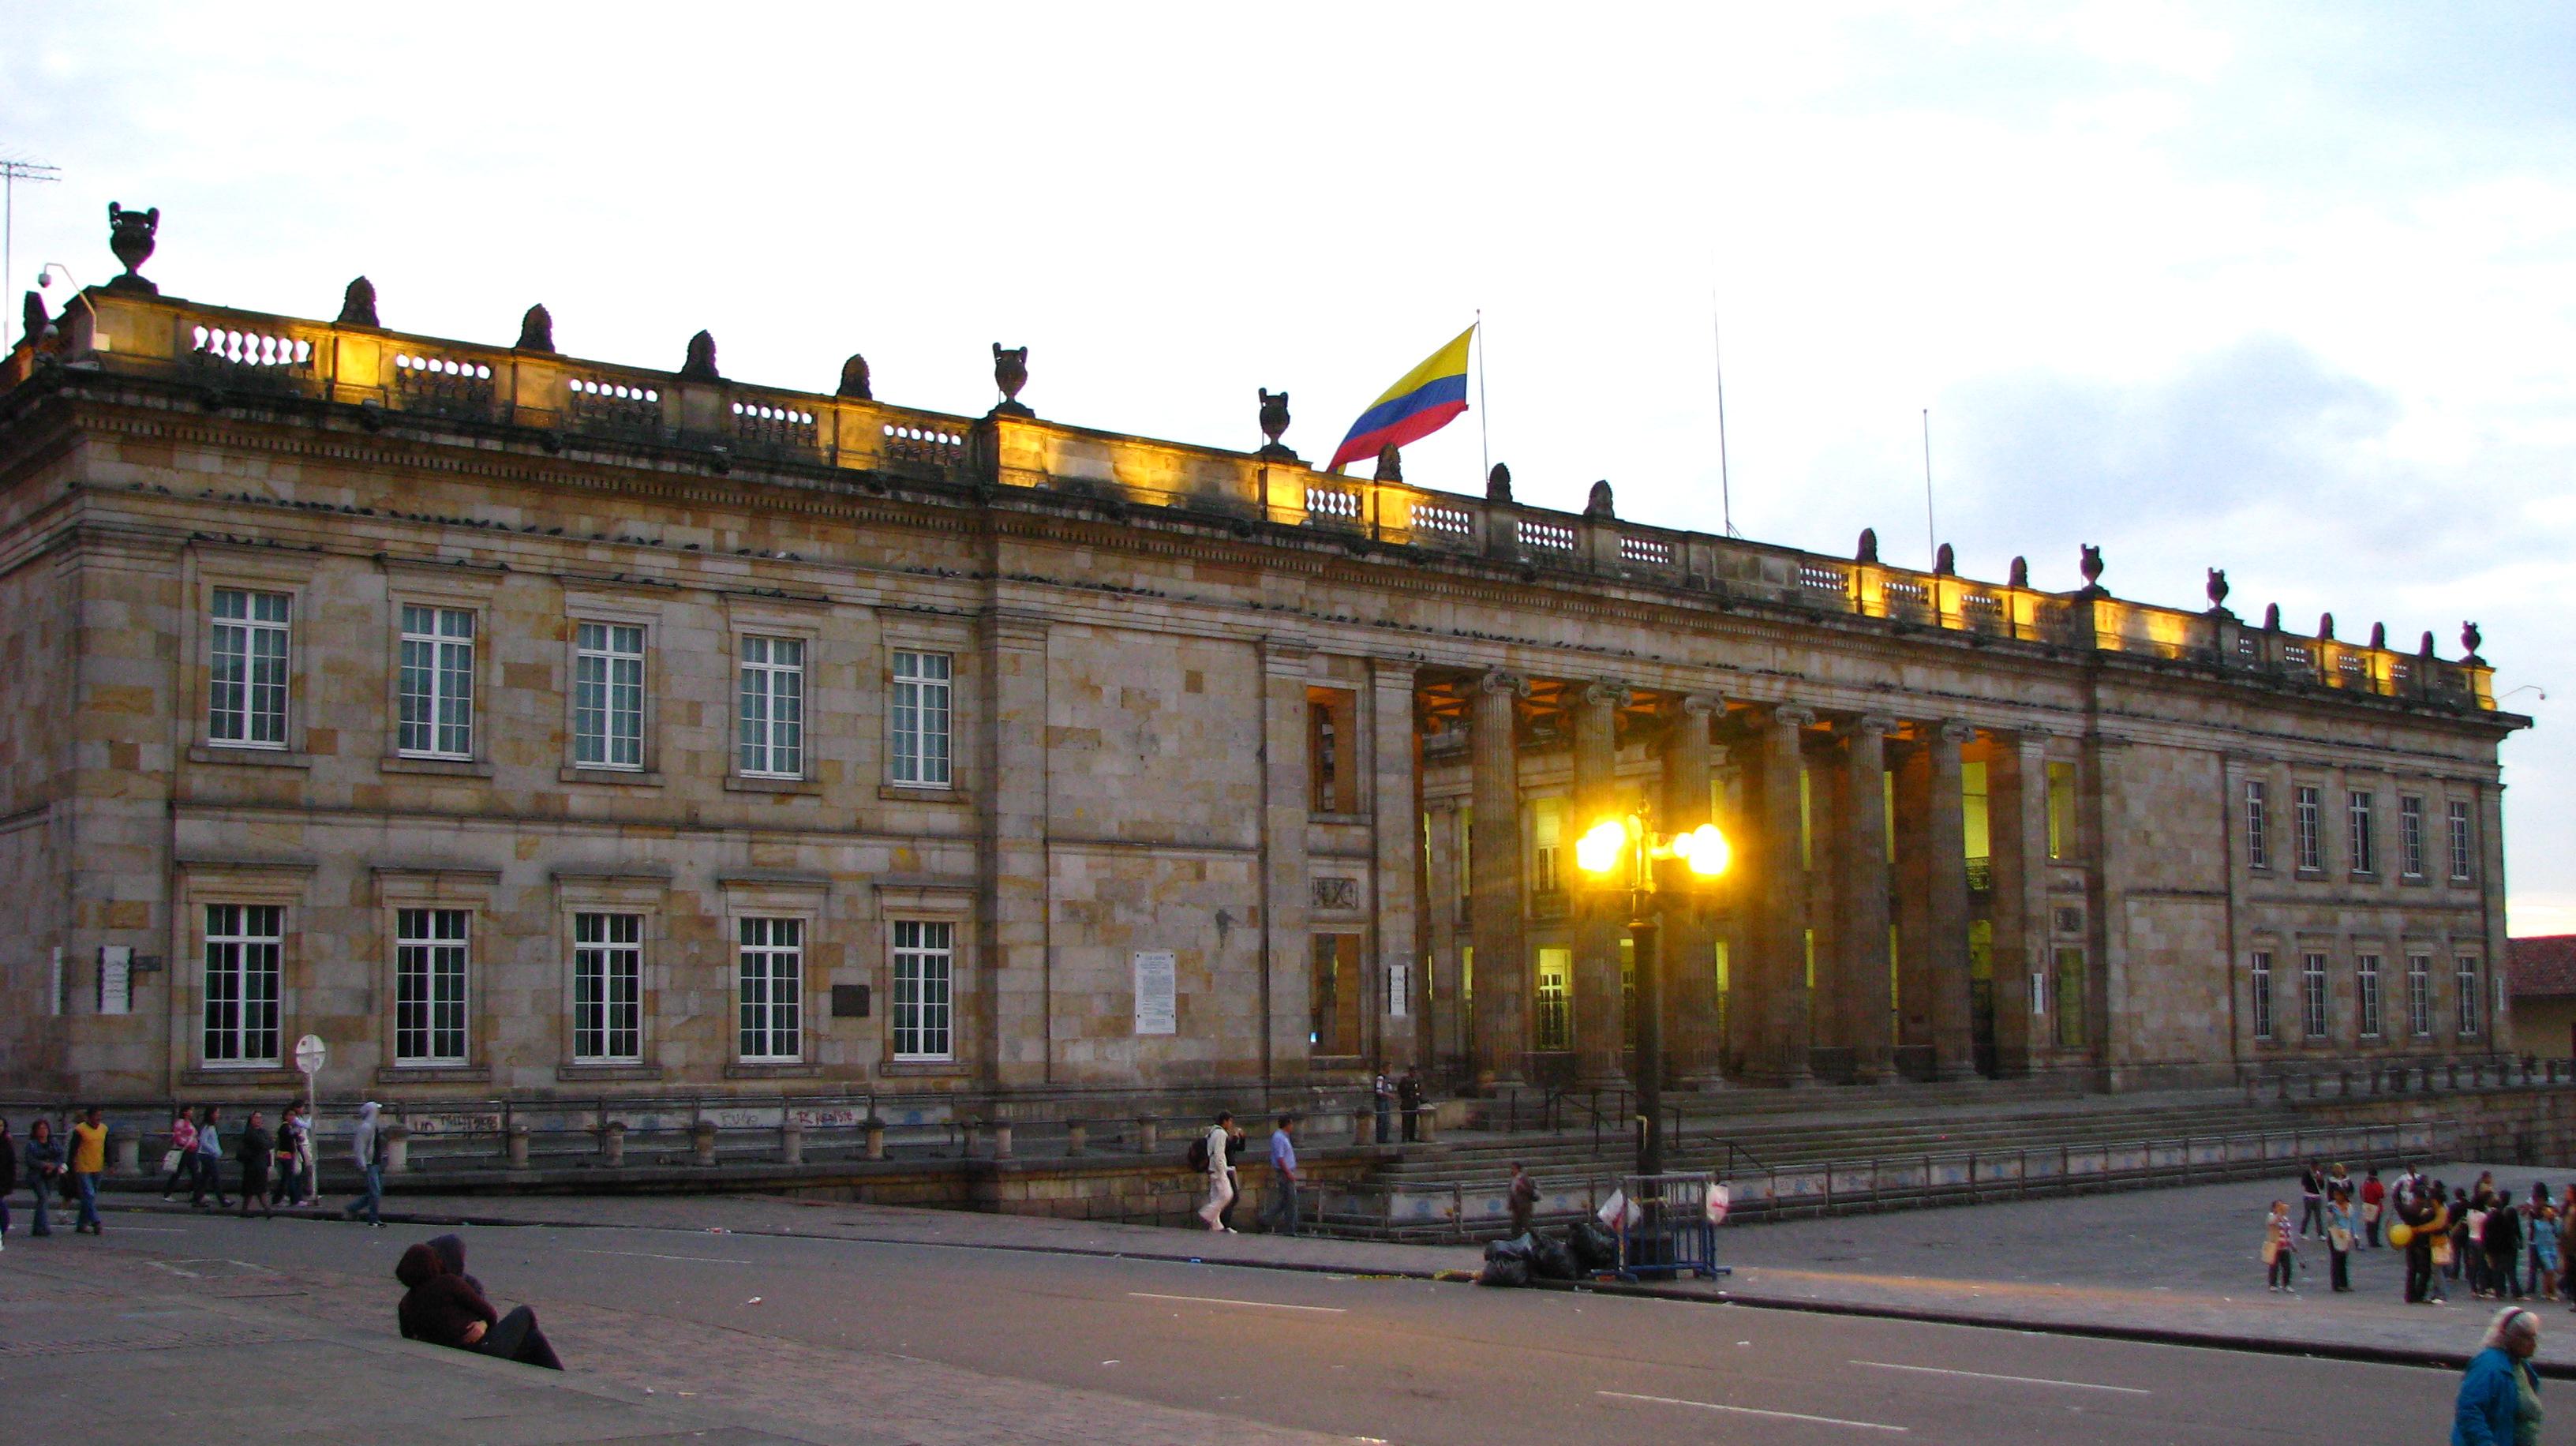 https://upload.wikimedia.org/wikipedia/commons/6/6c/El_Capitolio_Nacional_%28Bogot%C3%A1%2C_Colombia%29_1.jpg